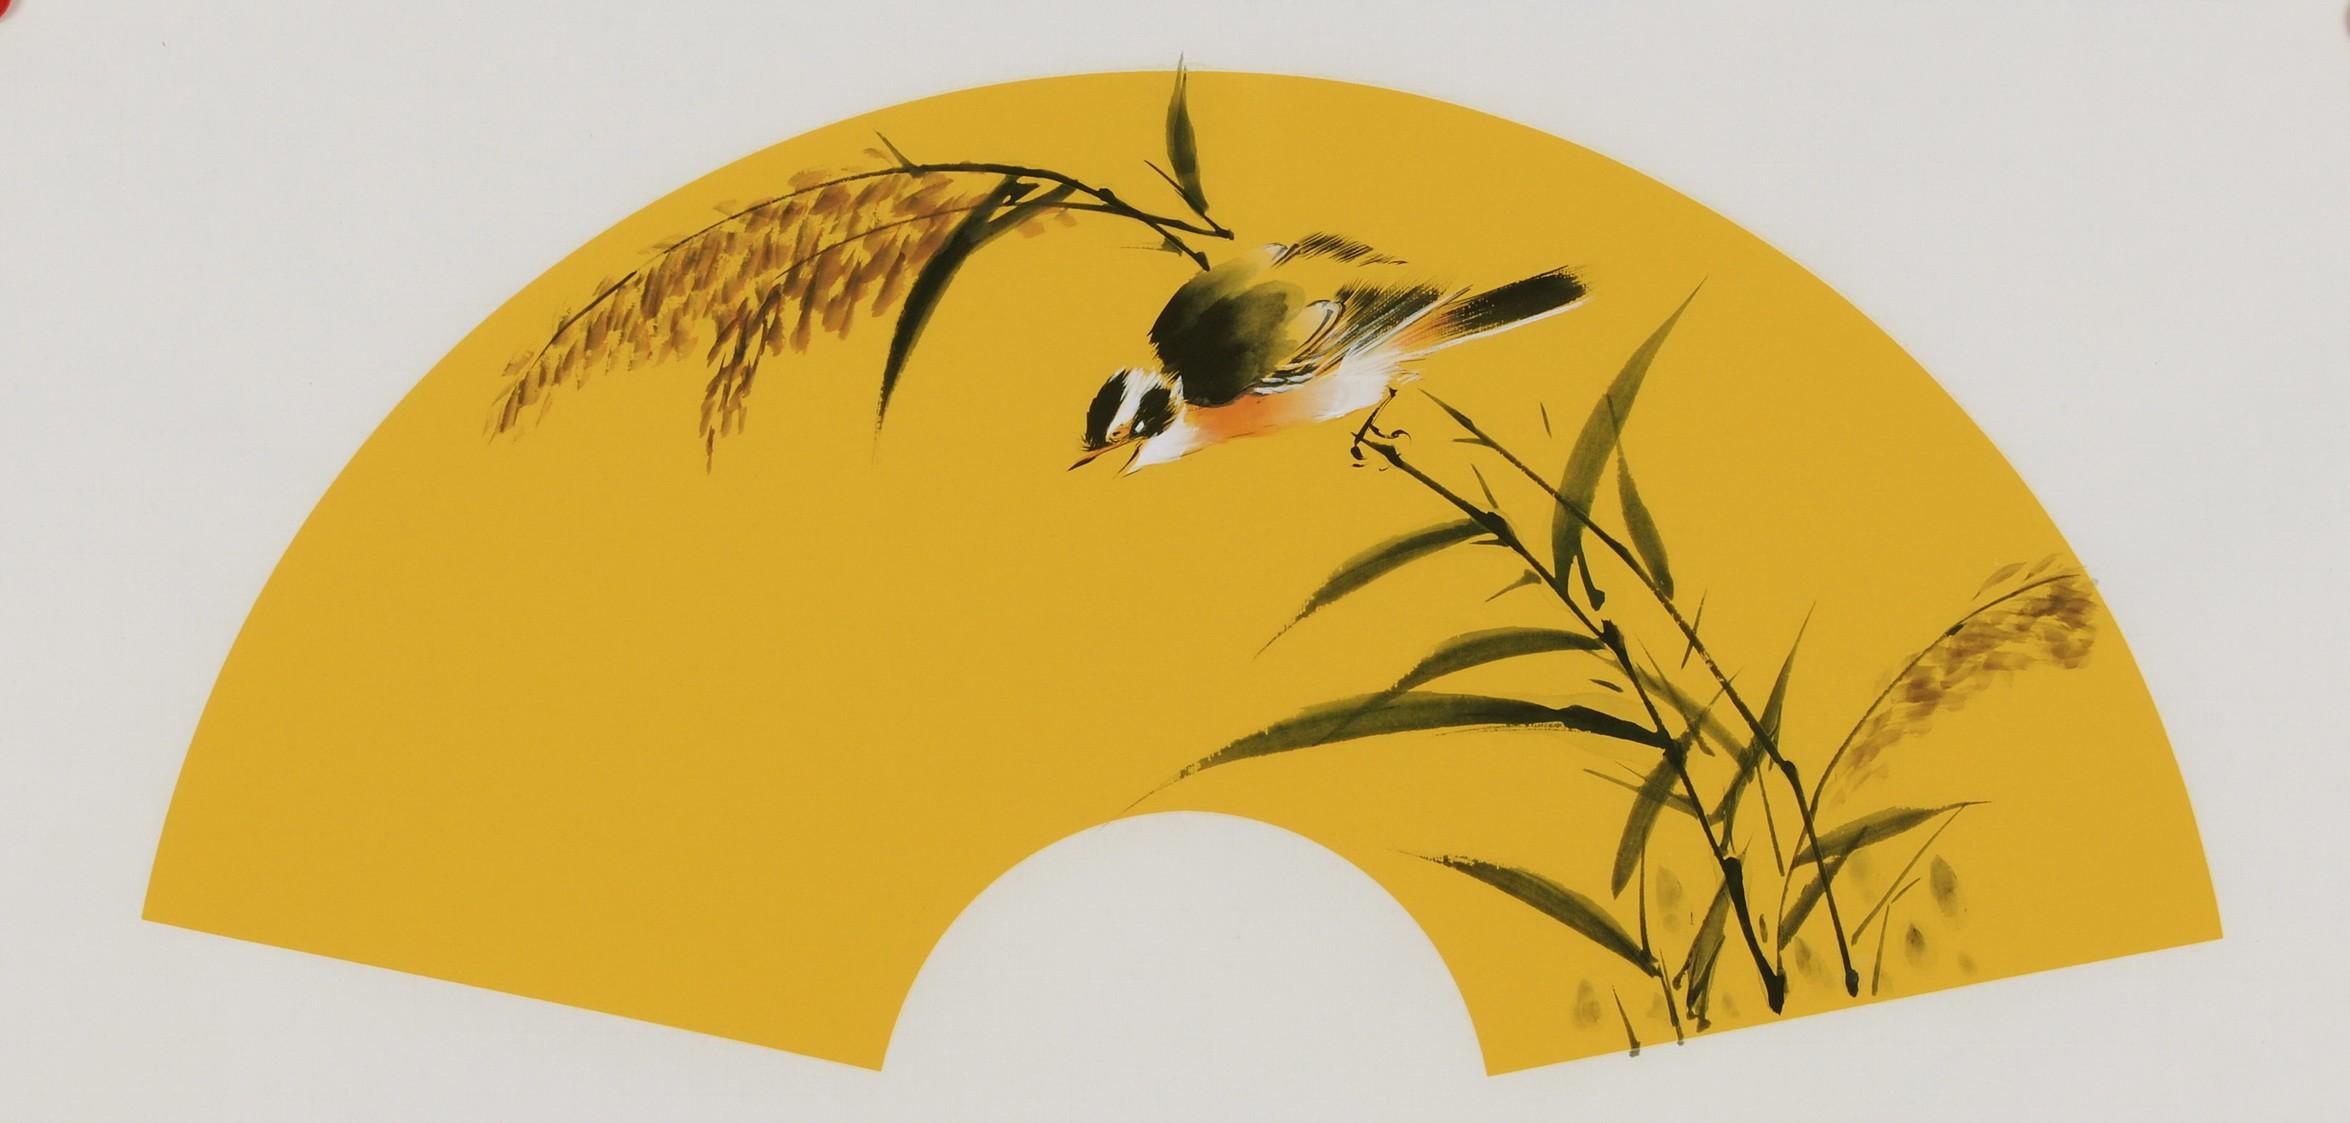 Reed - CNAG001640